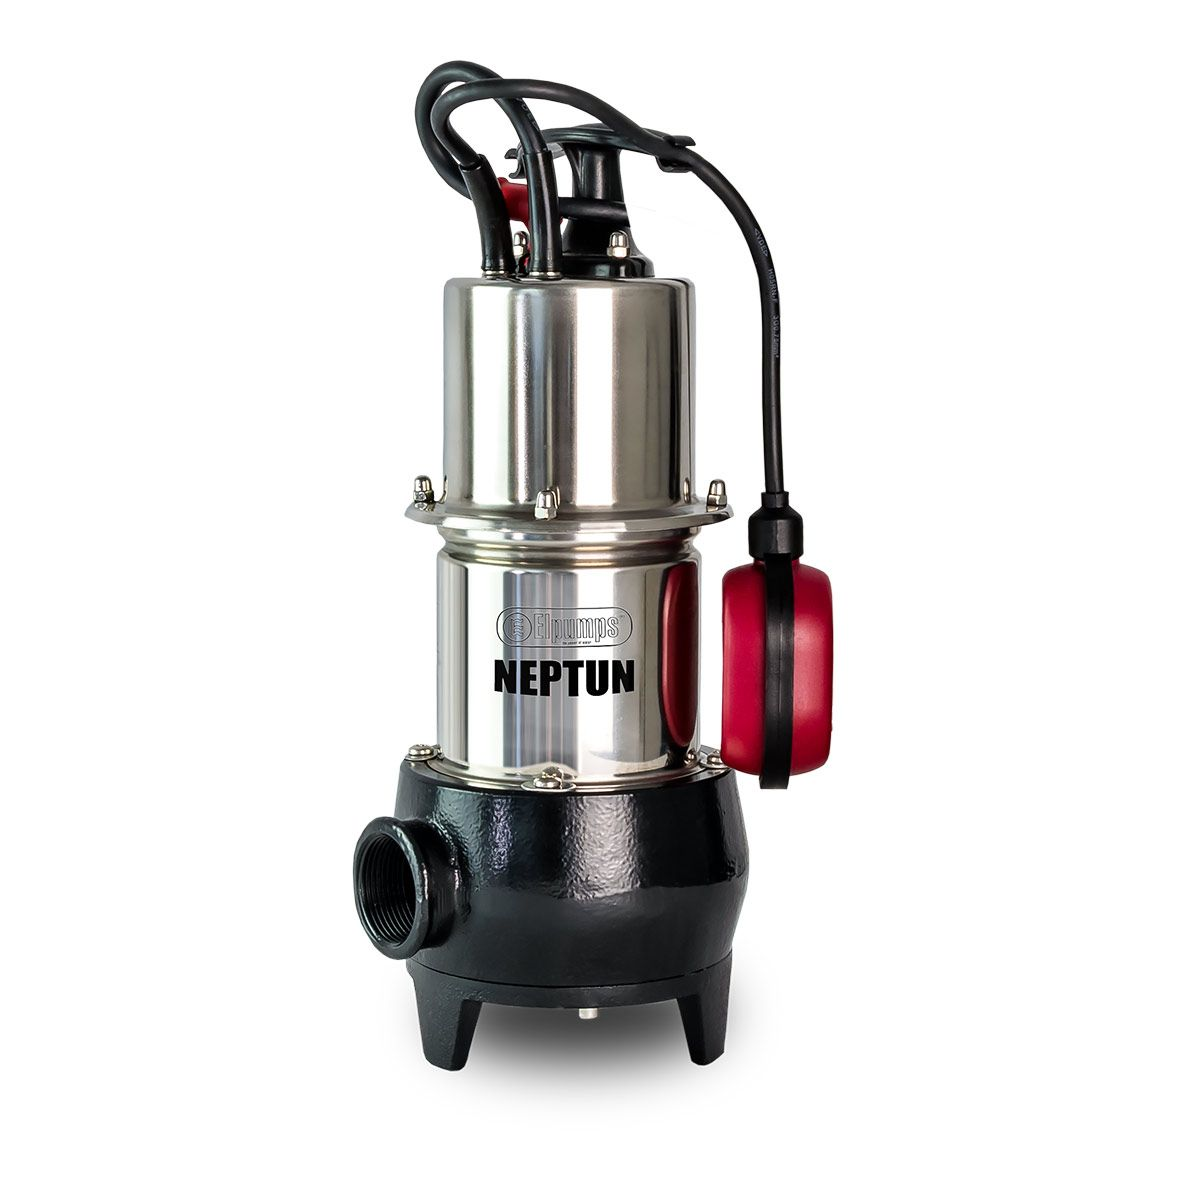 Schmutzwasserpumpe NEPTUN INOX